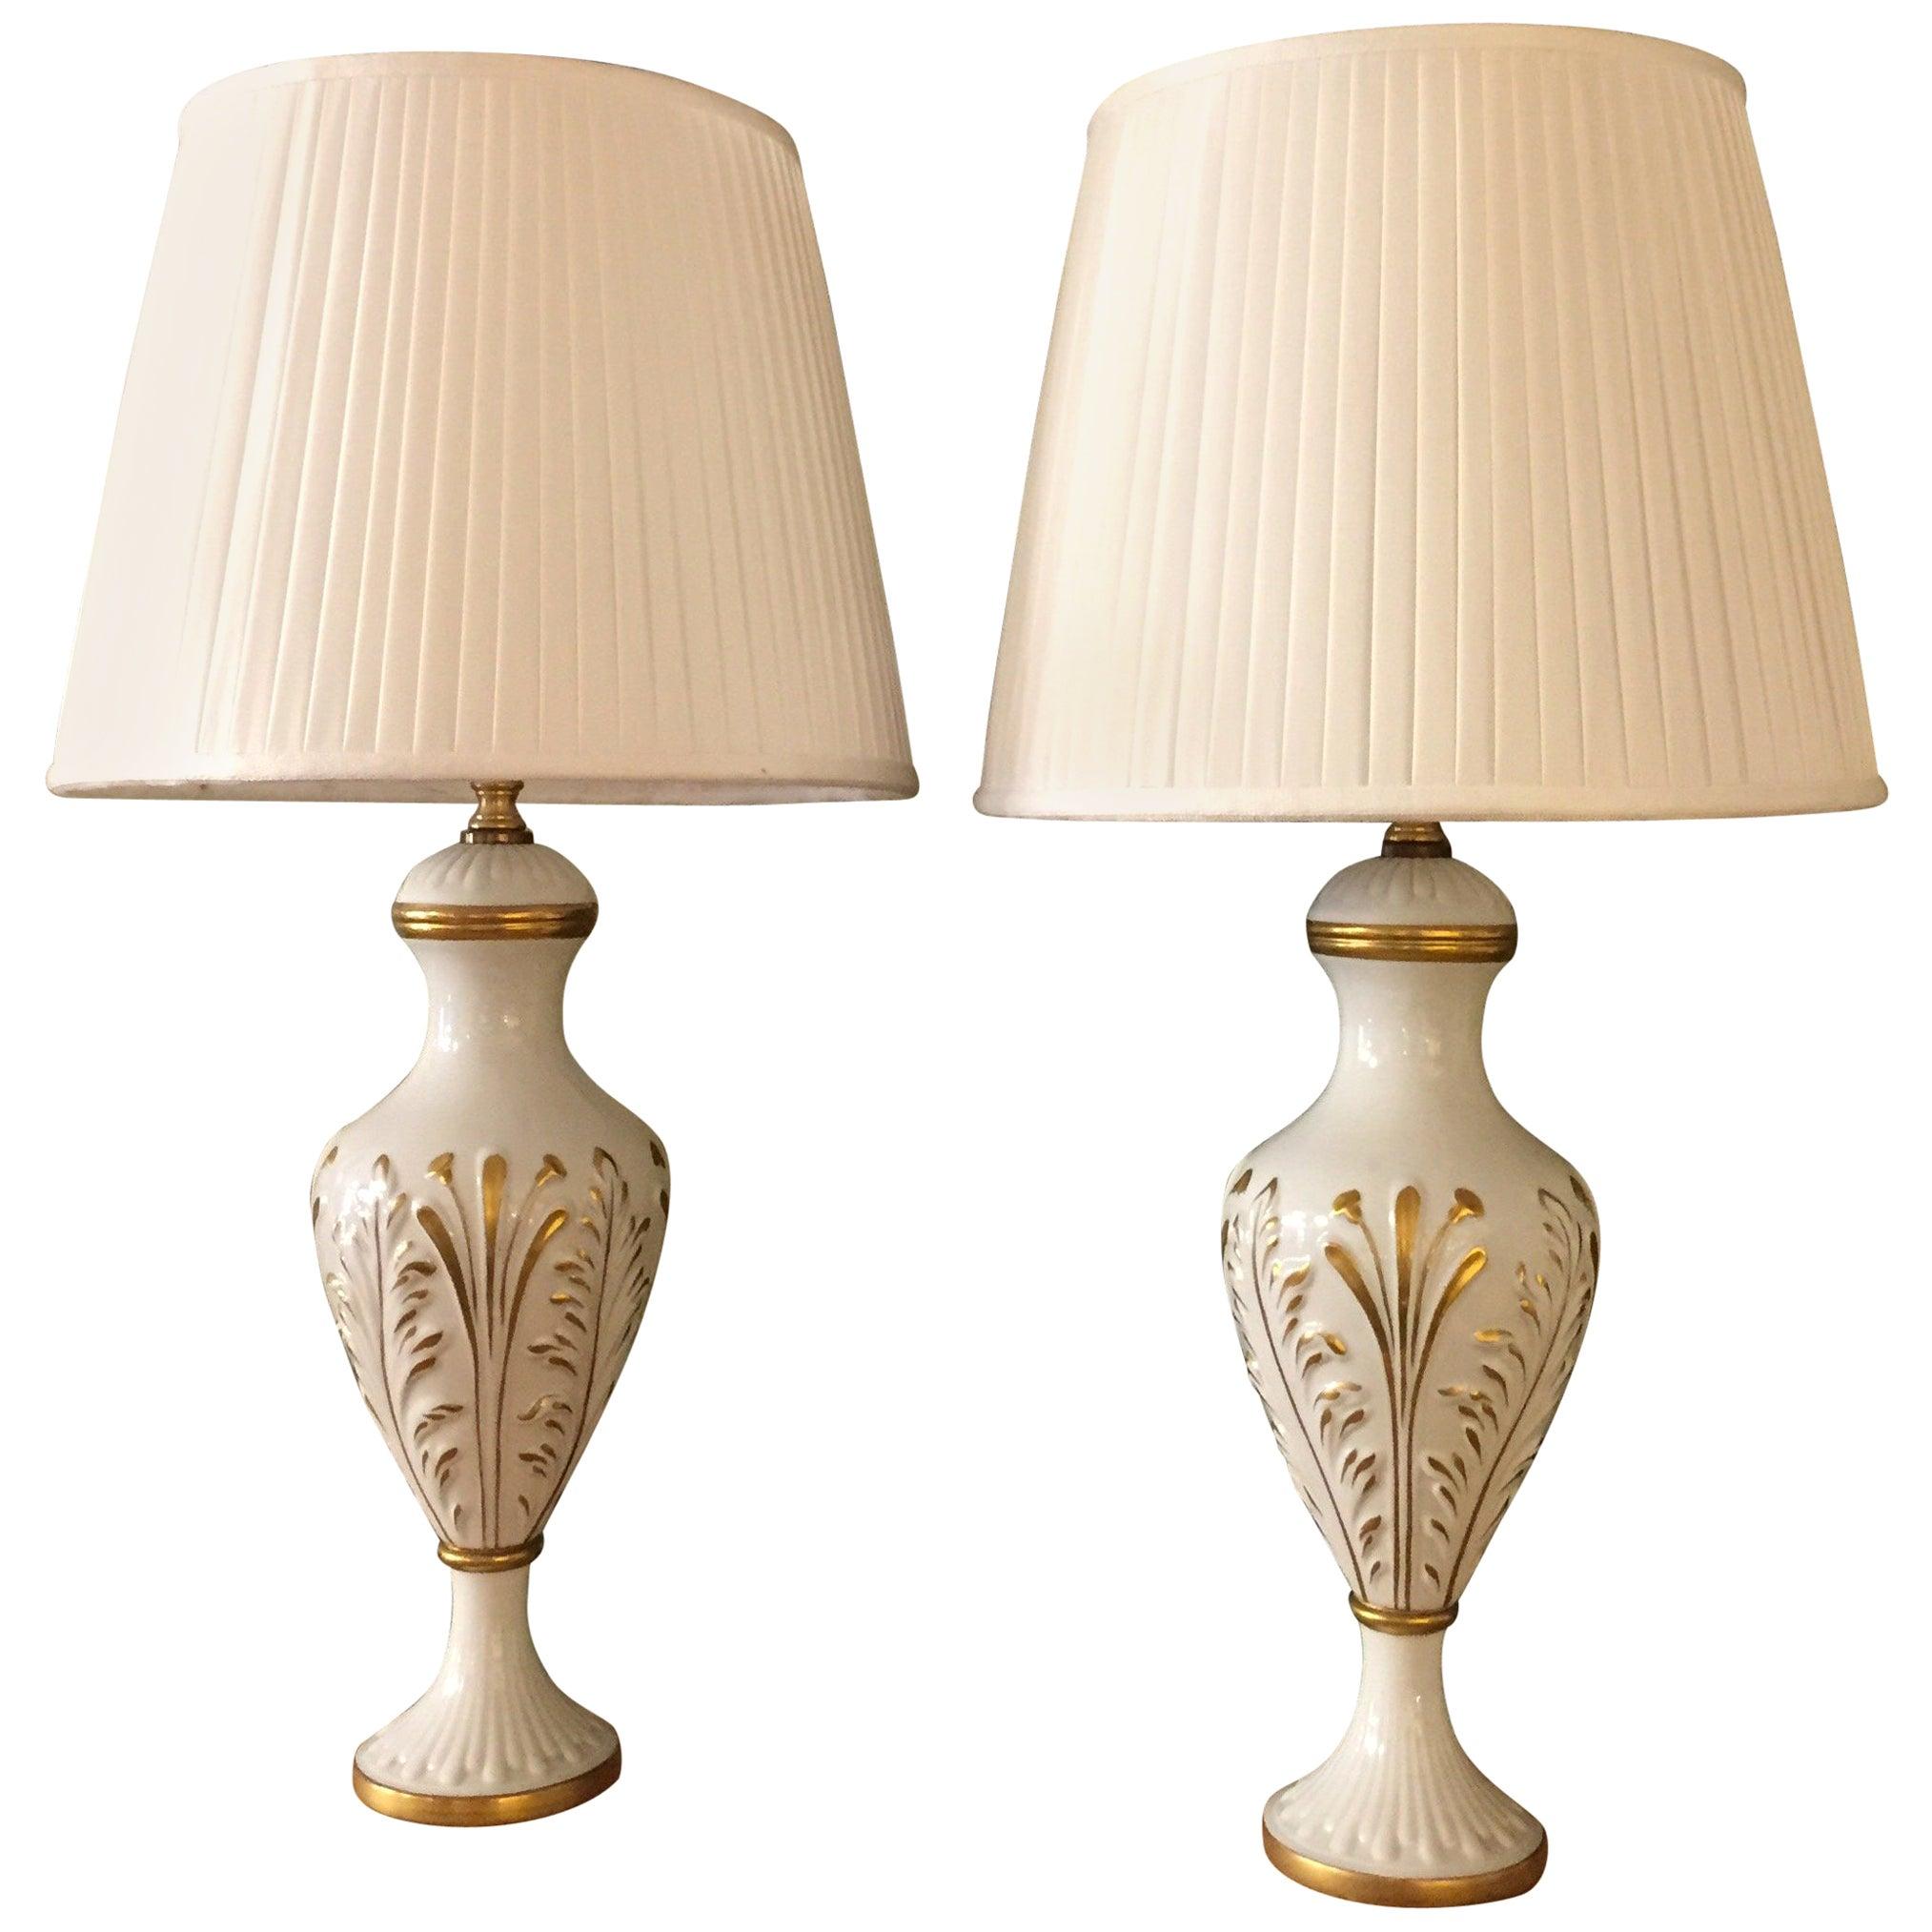 Mangani Firenze Pair of Italian White Table Lamps with Gold Foliate Motiv